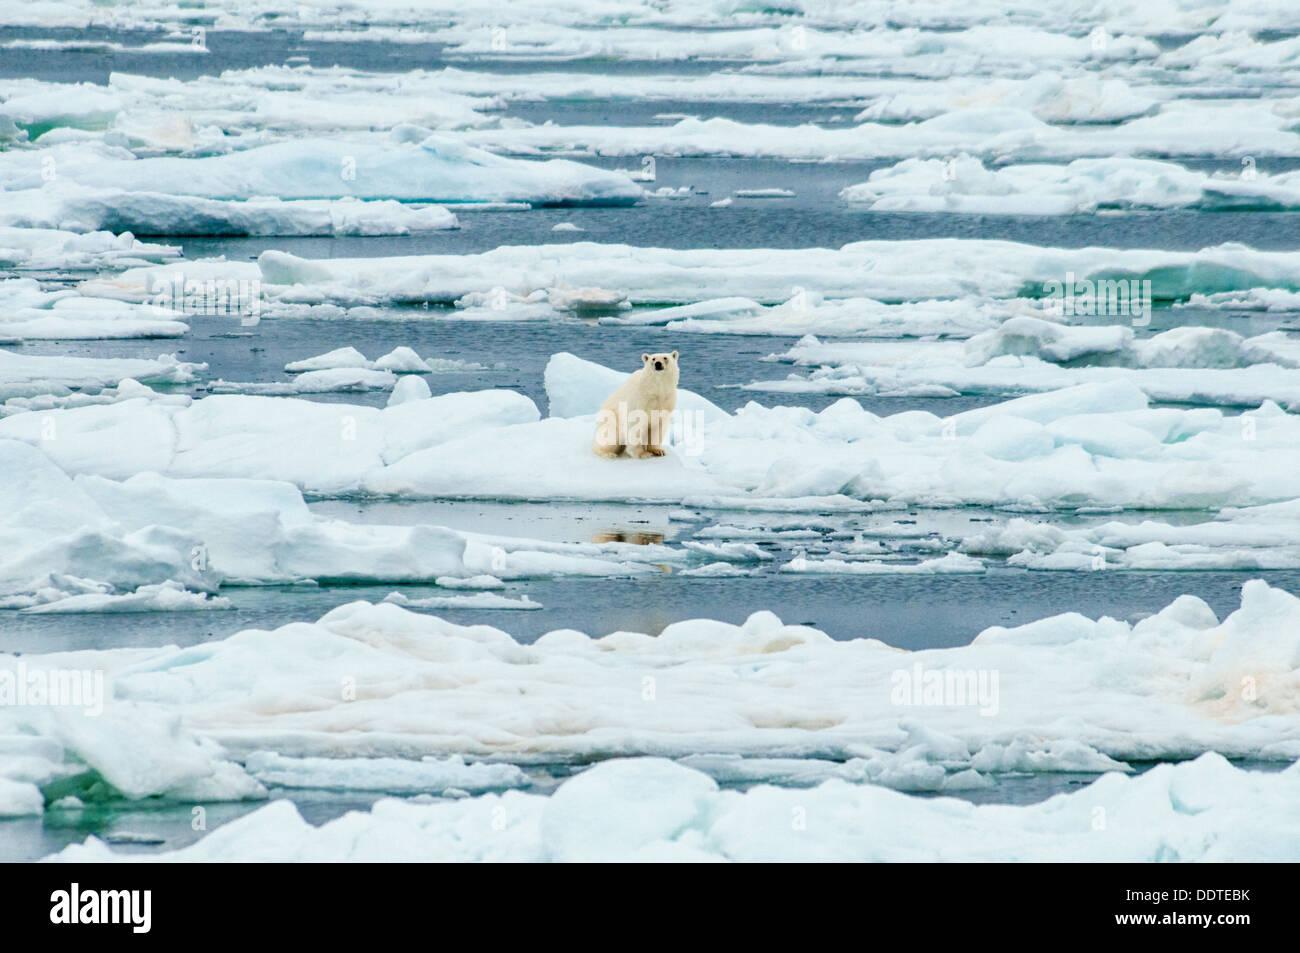 Solitary Polar Bear, Ursus Maritimus, sitting on melting ice, Olgastretet Pack Ice, Svalbard Archipelago, Norway Stock Photo